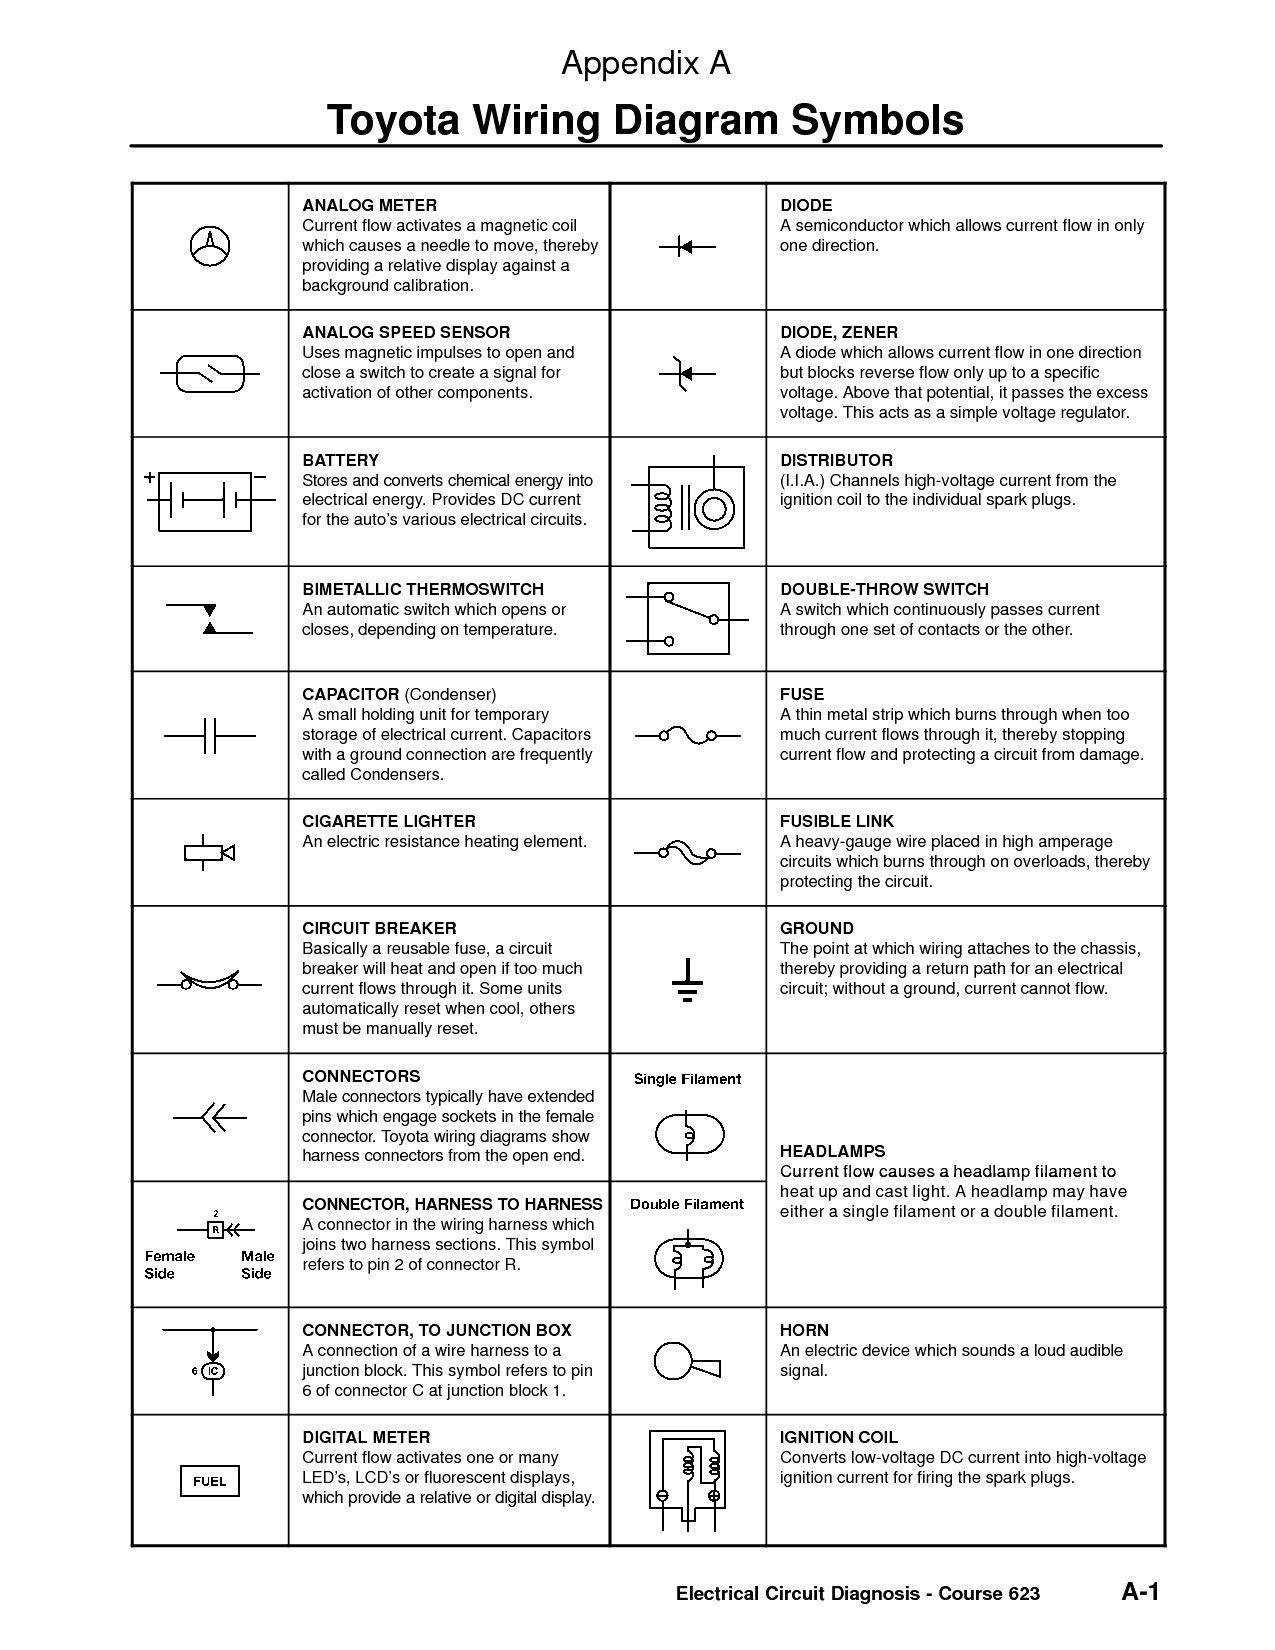 New Electrical Symbols For Outlet Diagram Wiringdiagram Diagramming Diagramm Visuals Visu Electrical Symbols Electrical Wiring Diagram Electrical Diagram